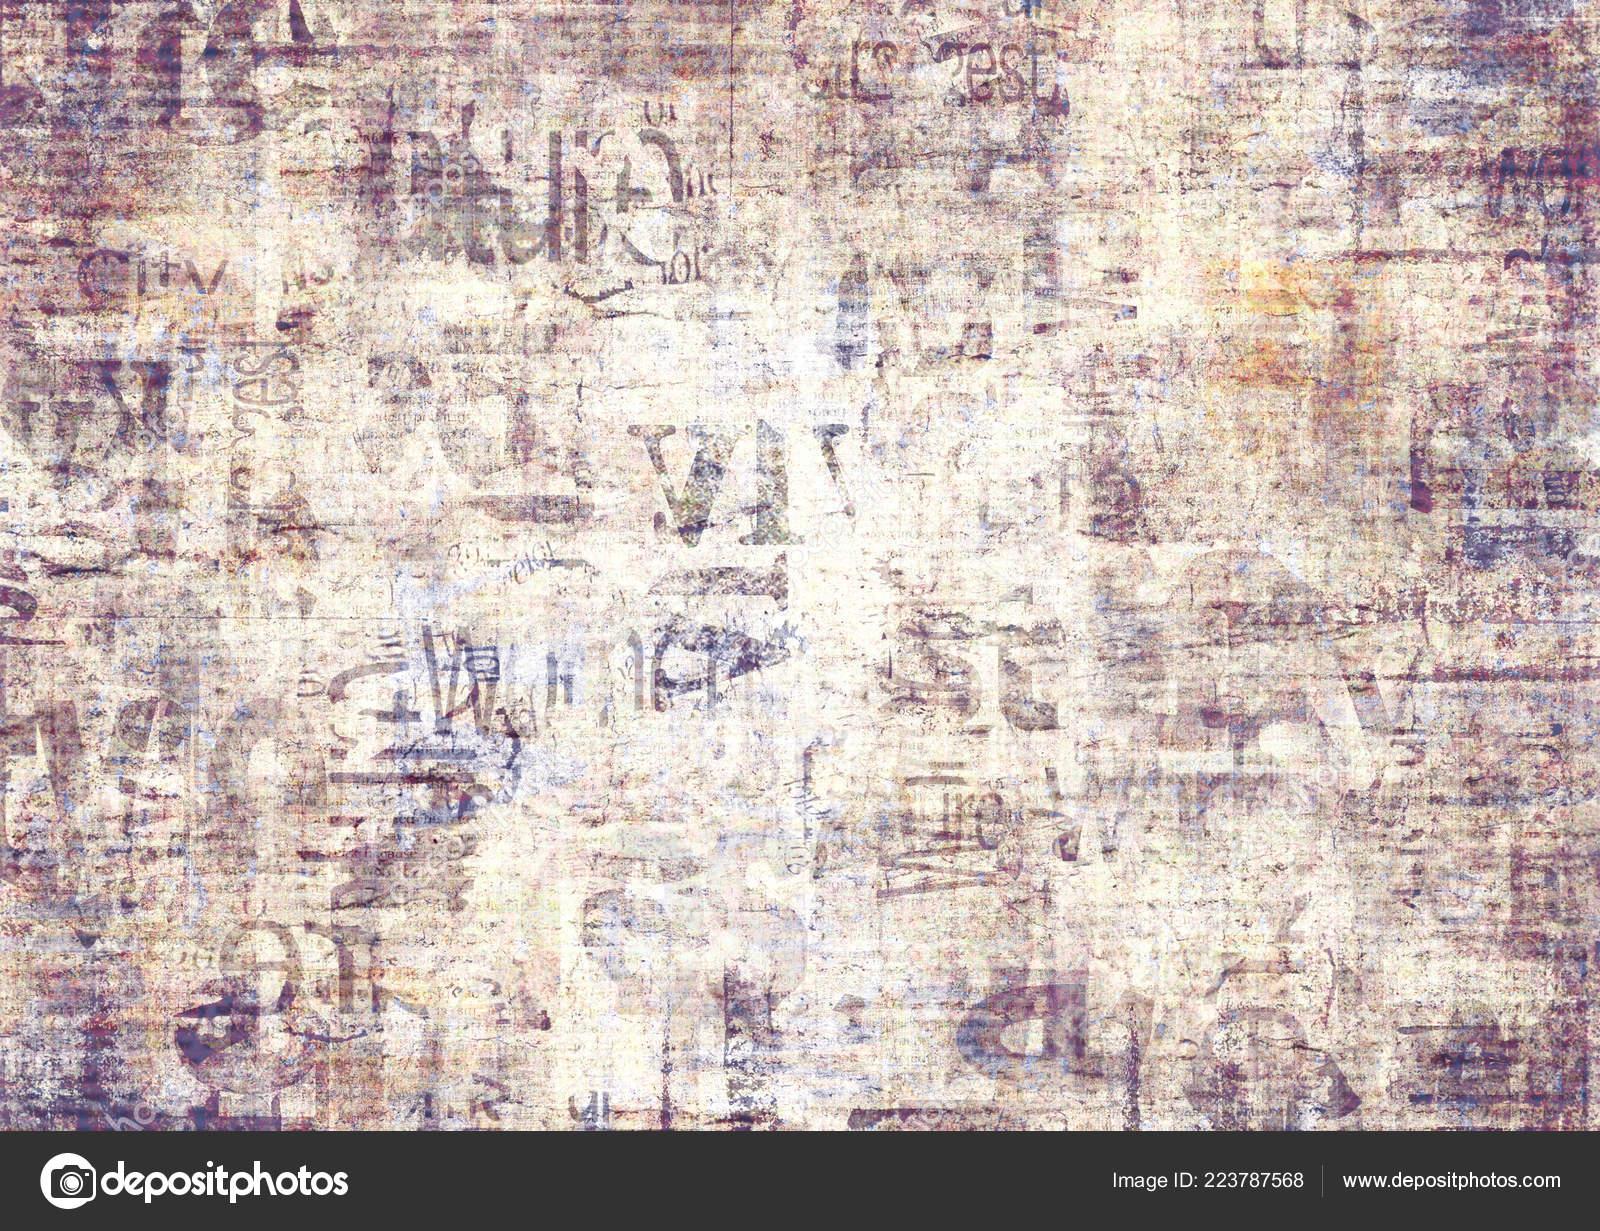 Papel Periódico Viejo Grunge Textura Fondo Horizontal Textura Del